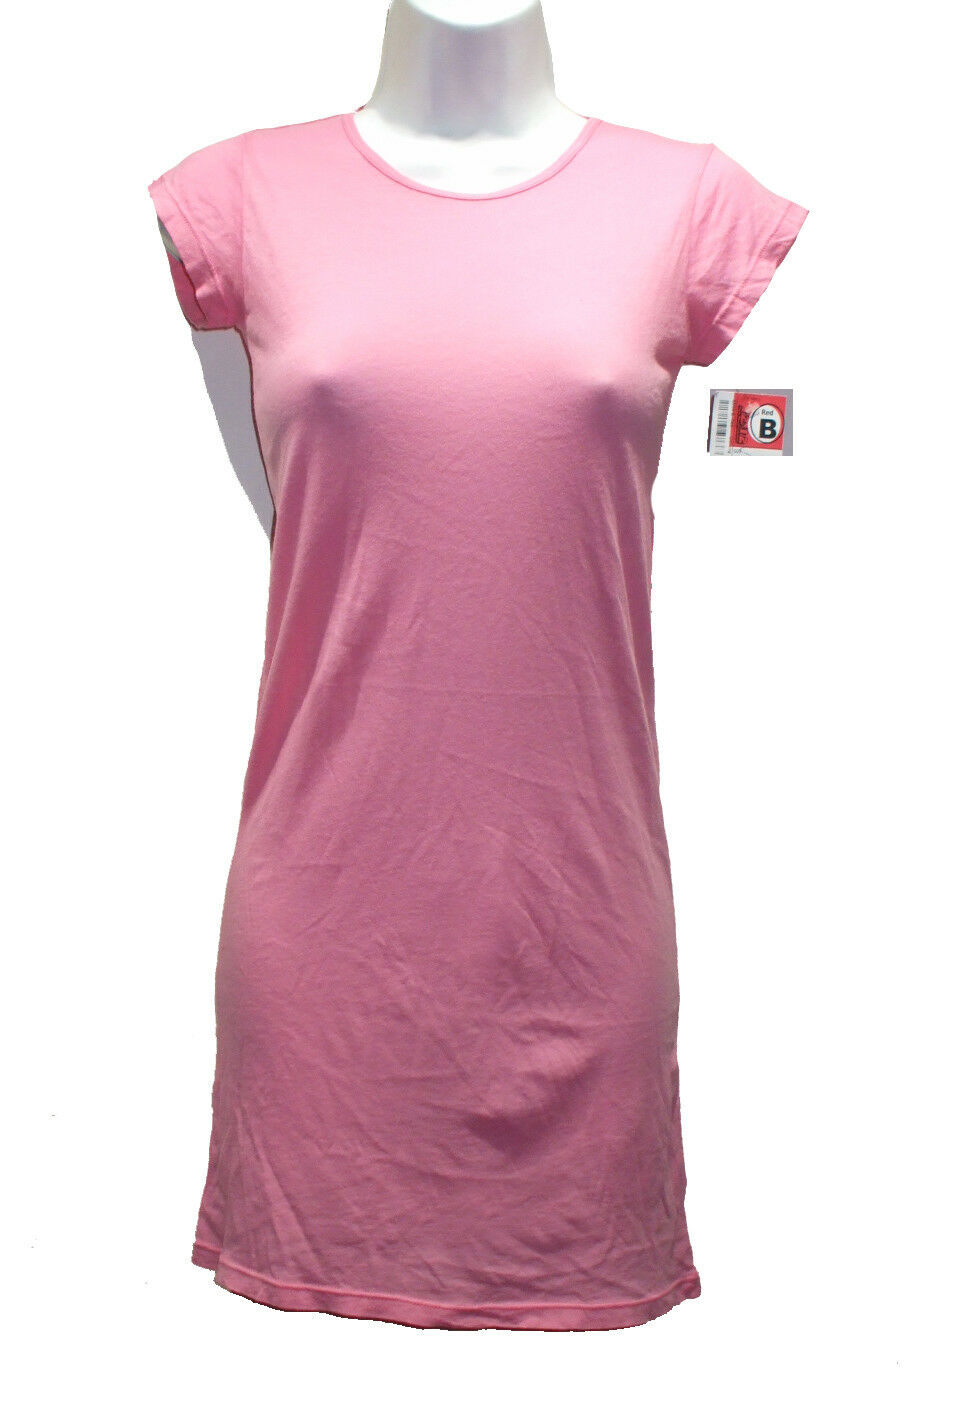 NEW LAmade pink Pink T-Shirt Dress Sz S 100% Cotton